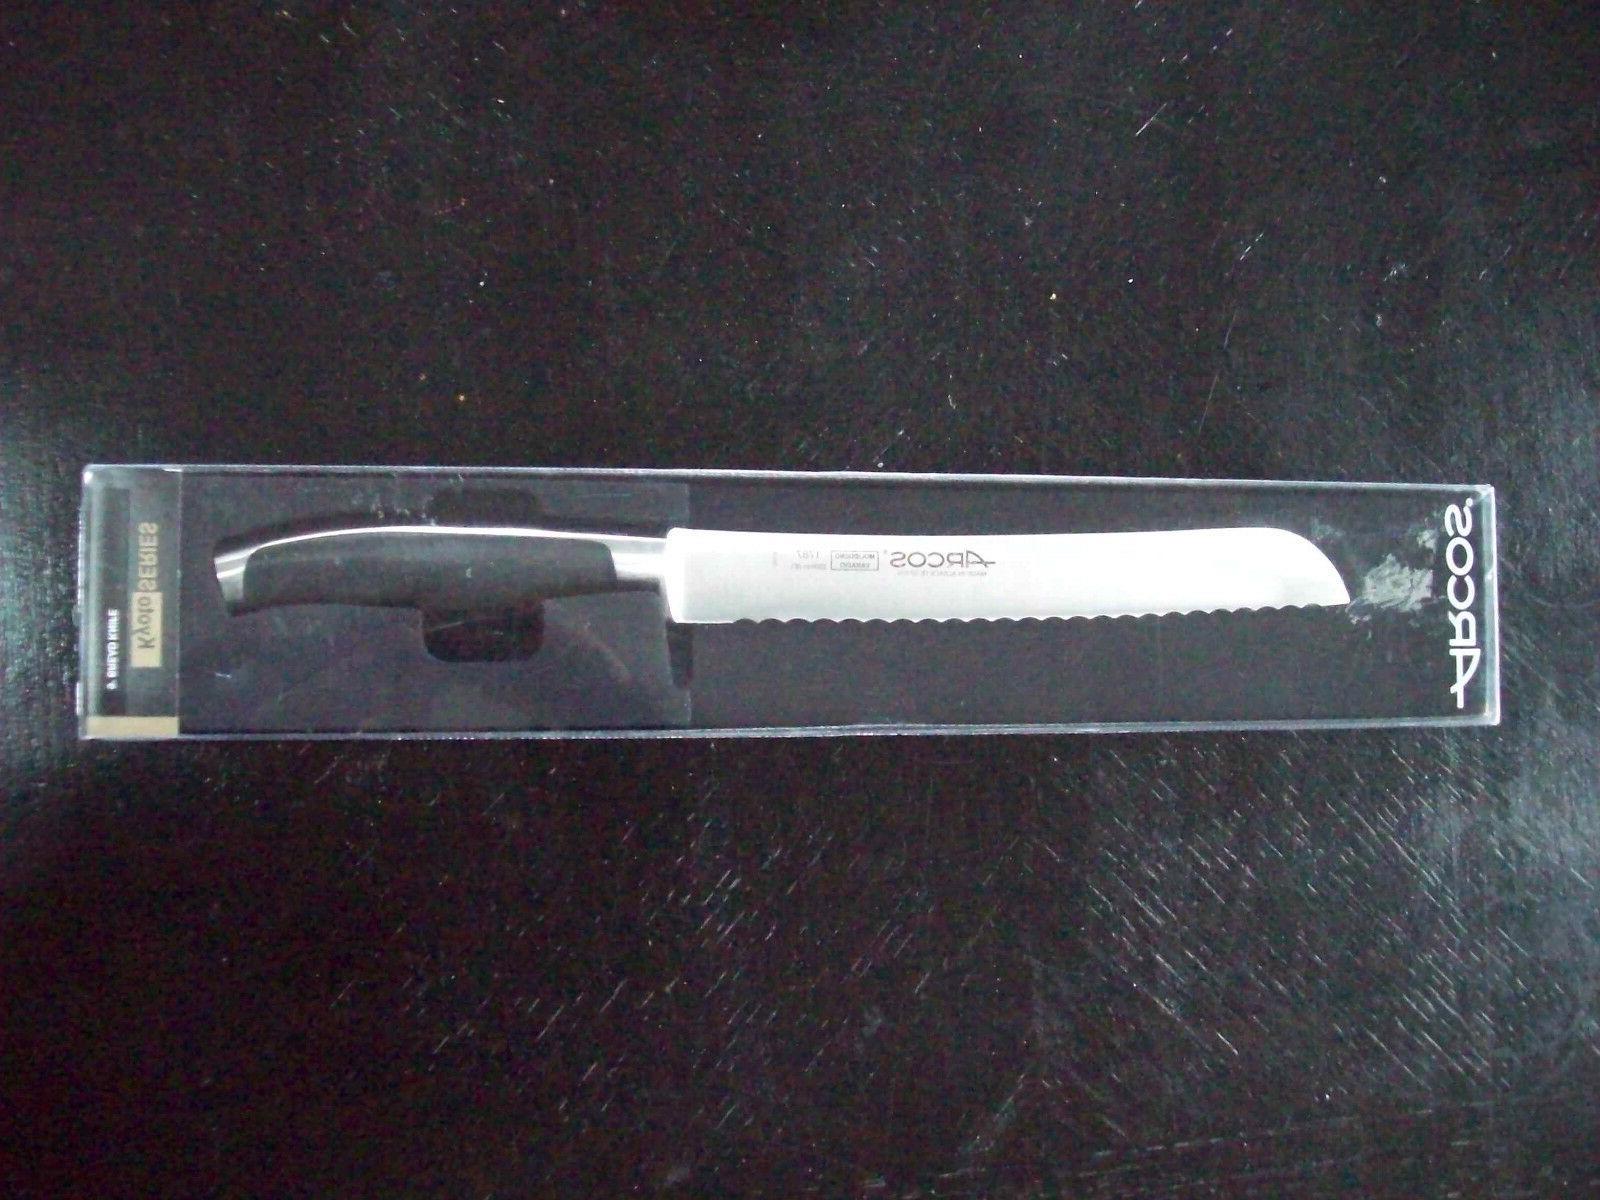 universal 8 inch bread knife new